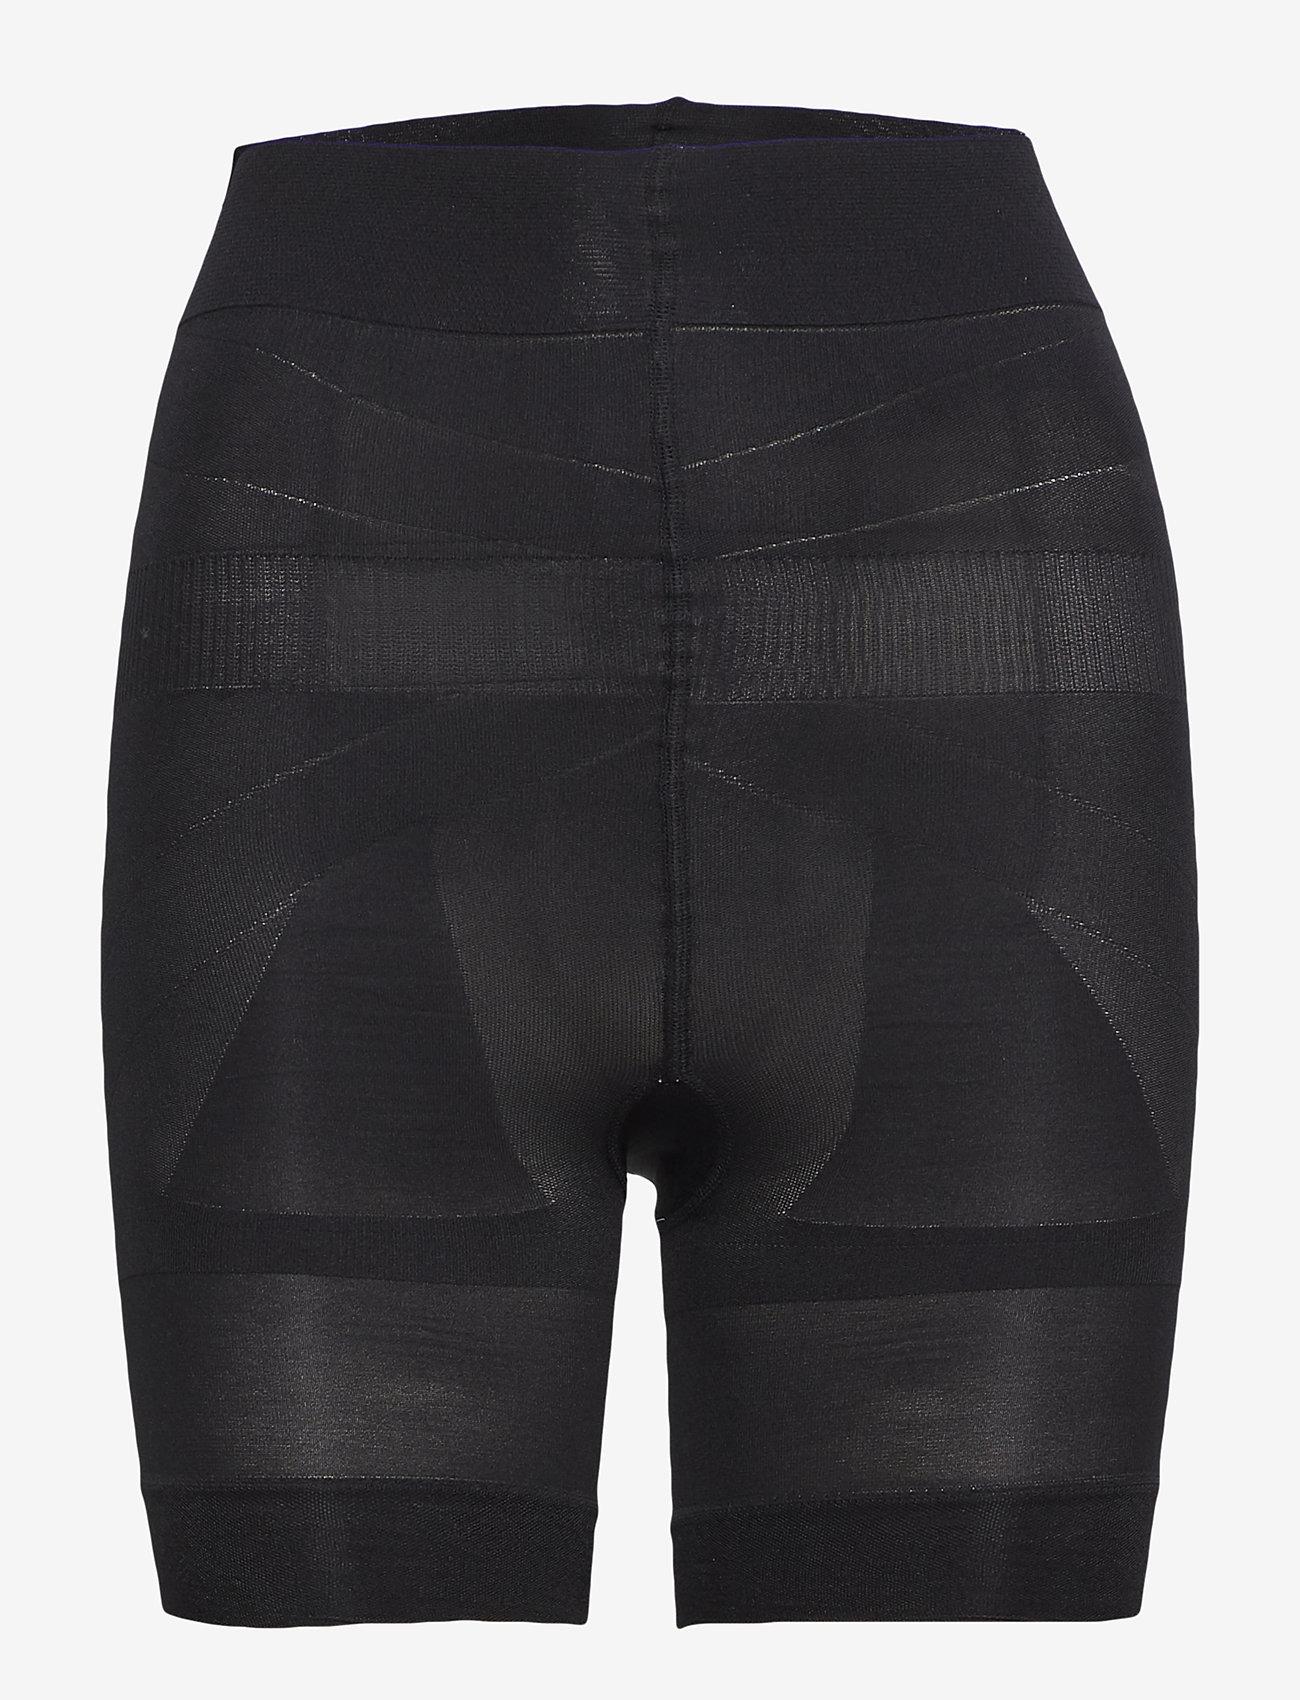 Swedish Stockings - Julia shaping shorts - bottoms - black - 0